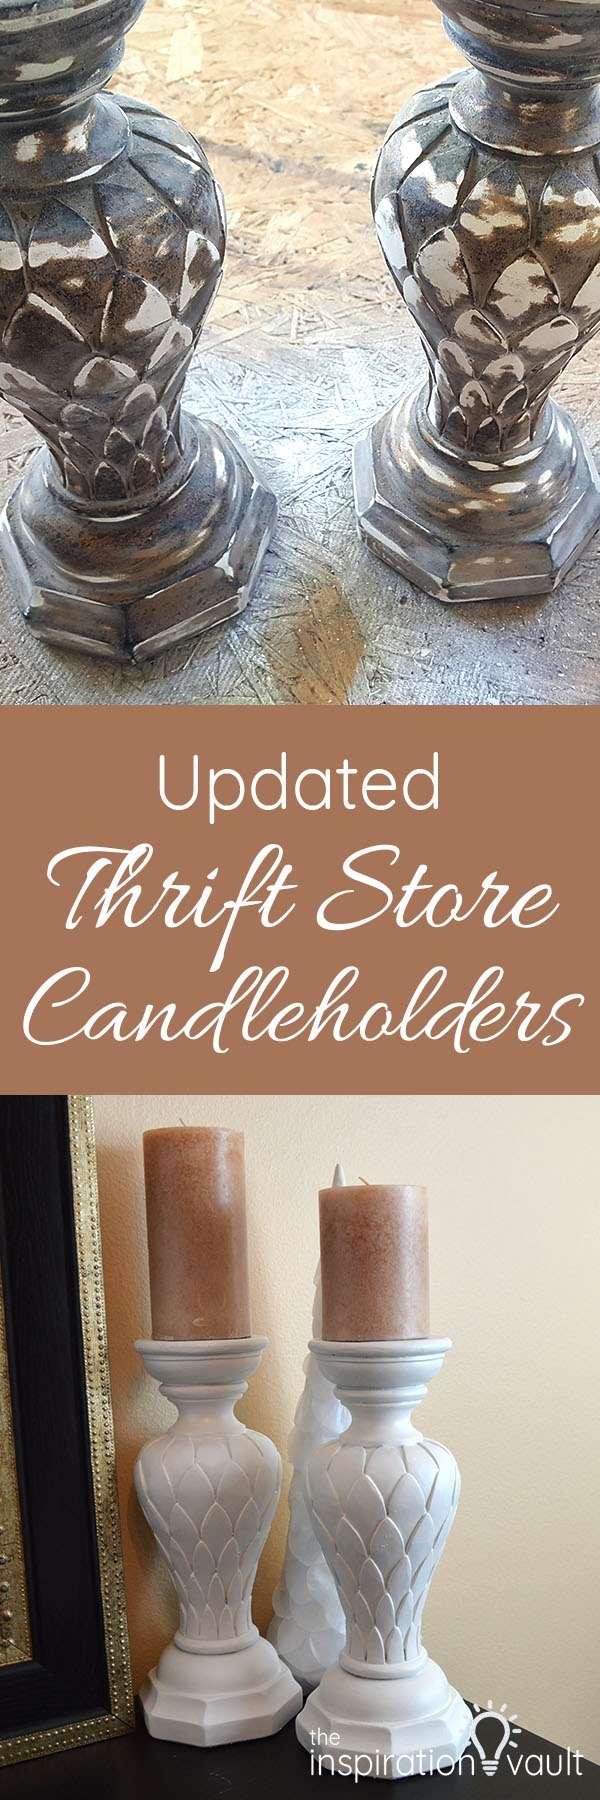 Updated Thrift Store Candleholders DIY Craft Tutorial Long